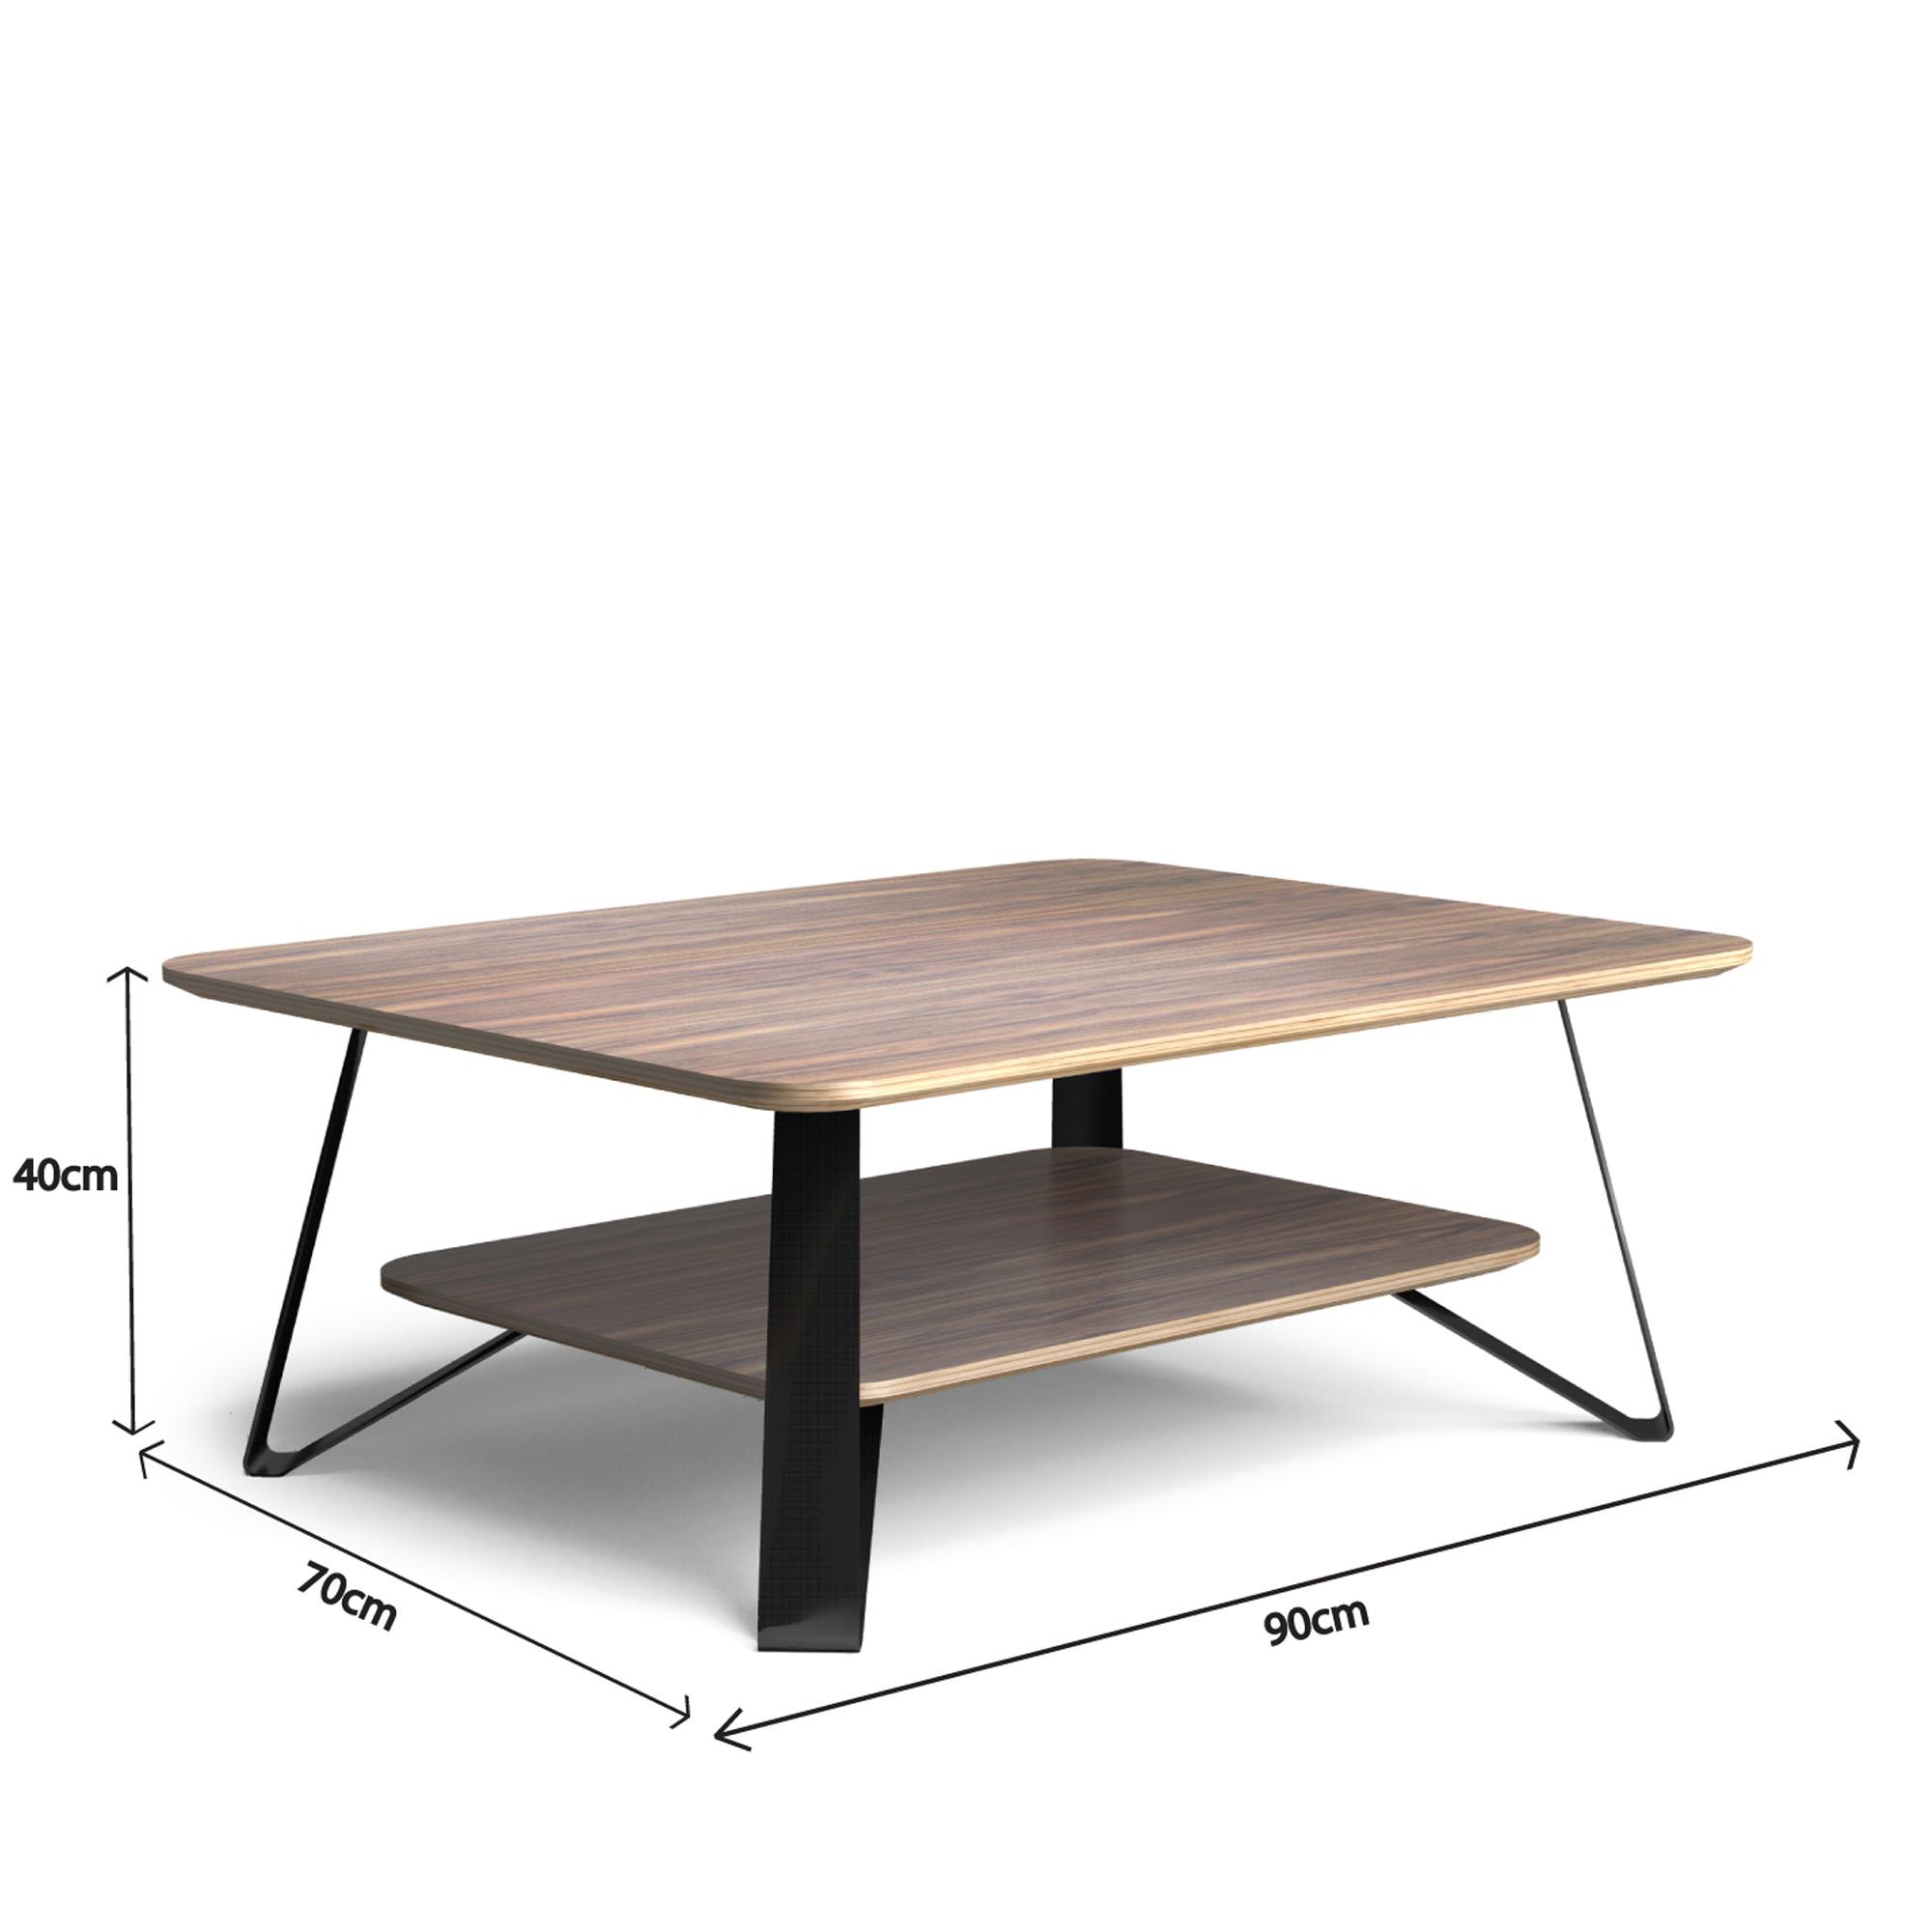 Table basse design image